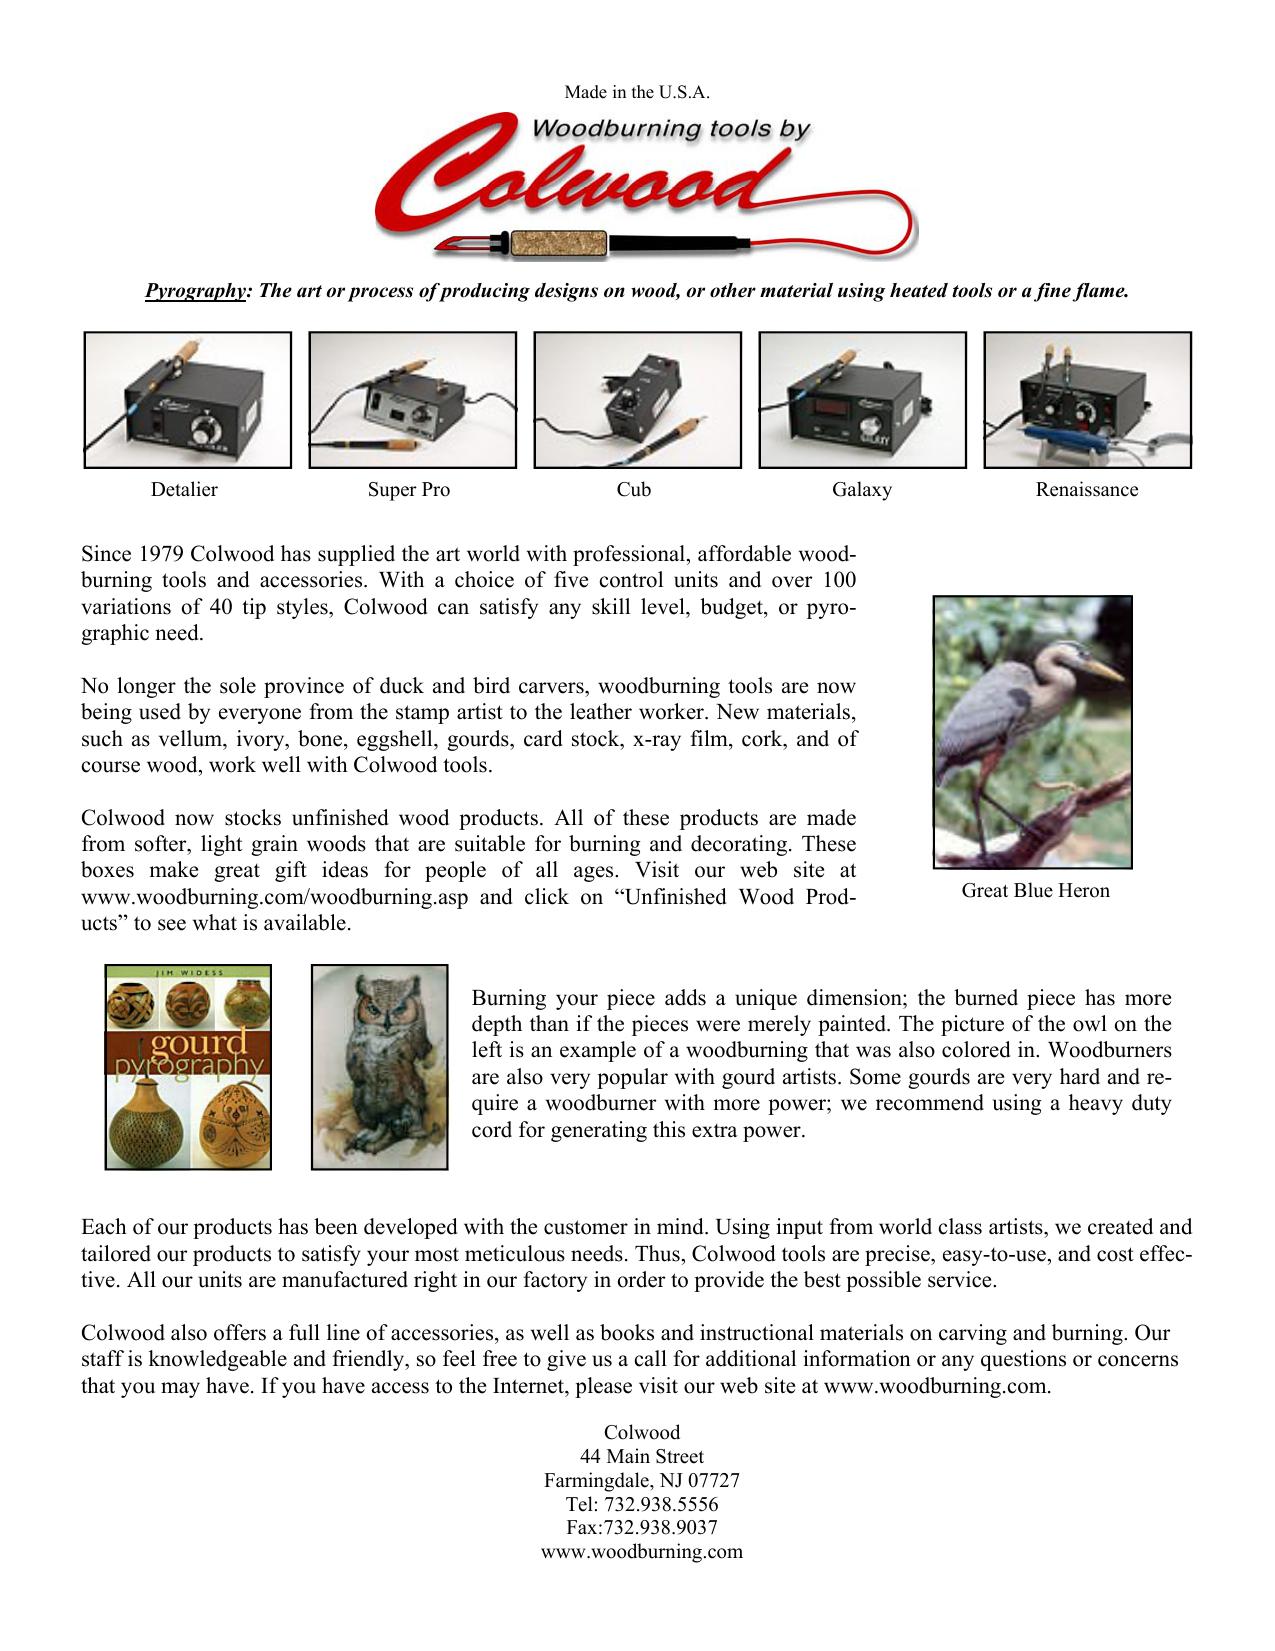 Catalog - Colwood Electronics, Inc